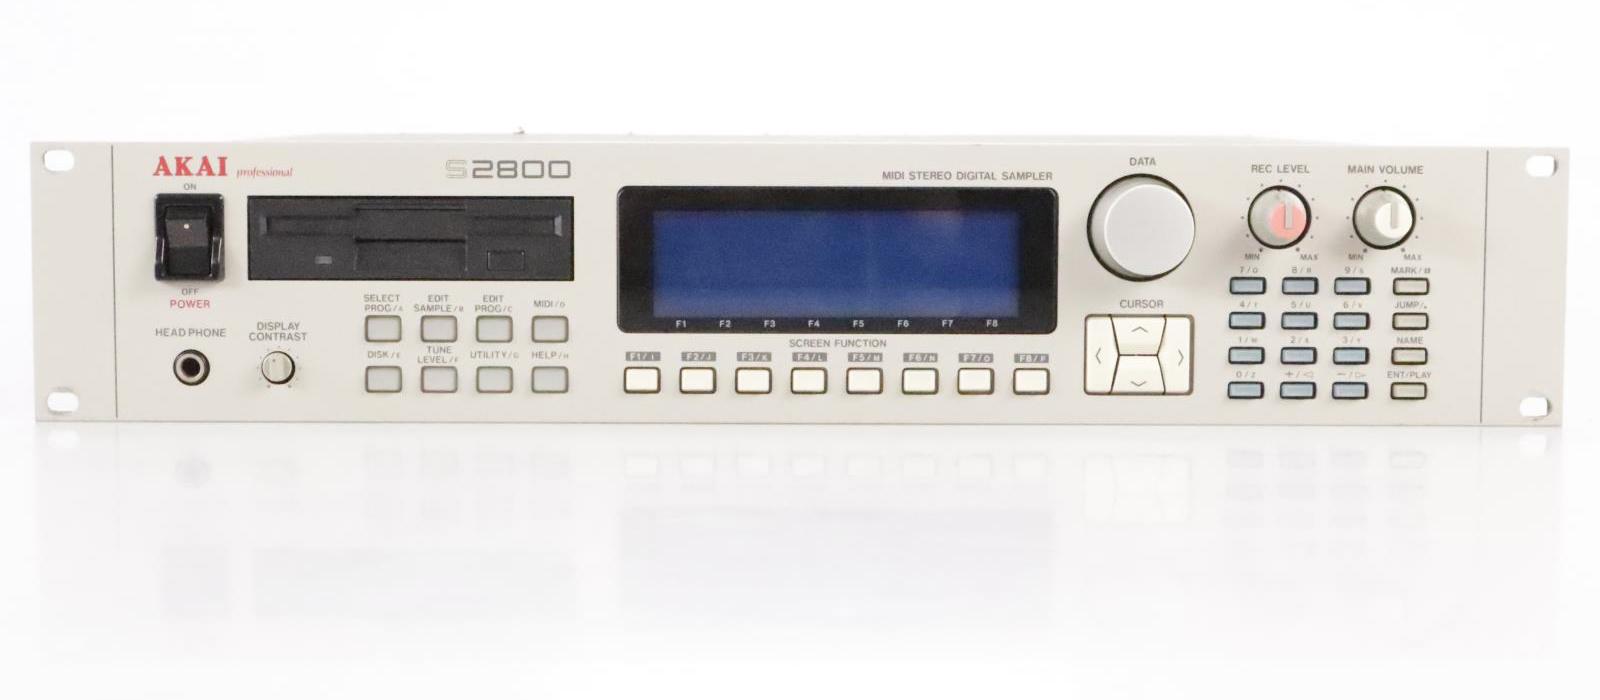 Akai S2800 midi stereo digital sampler